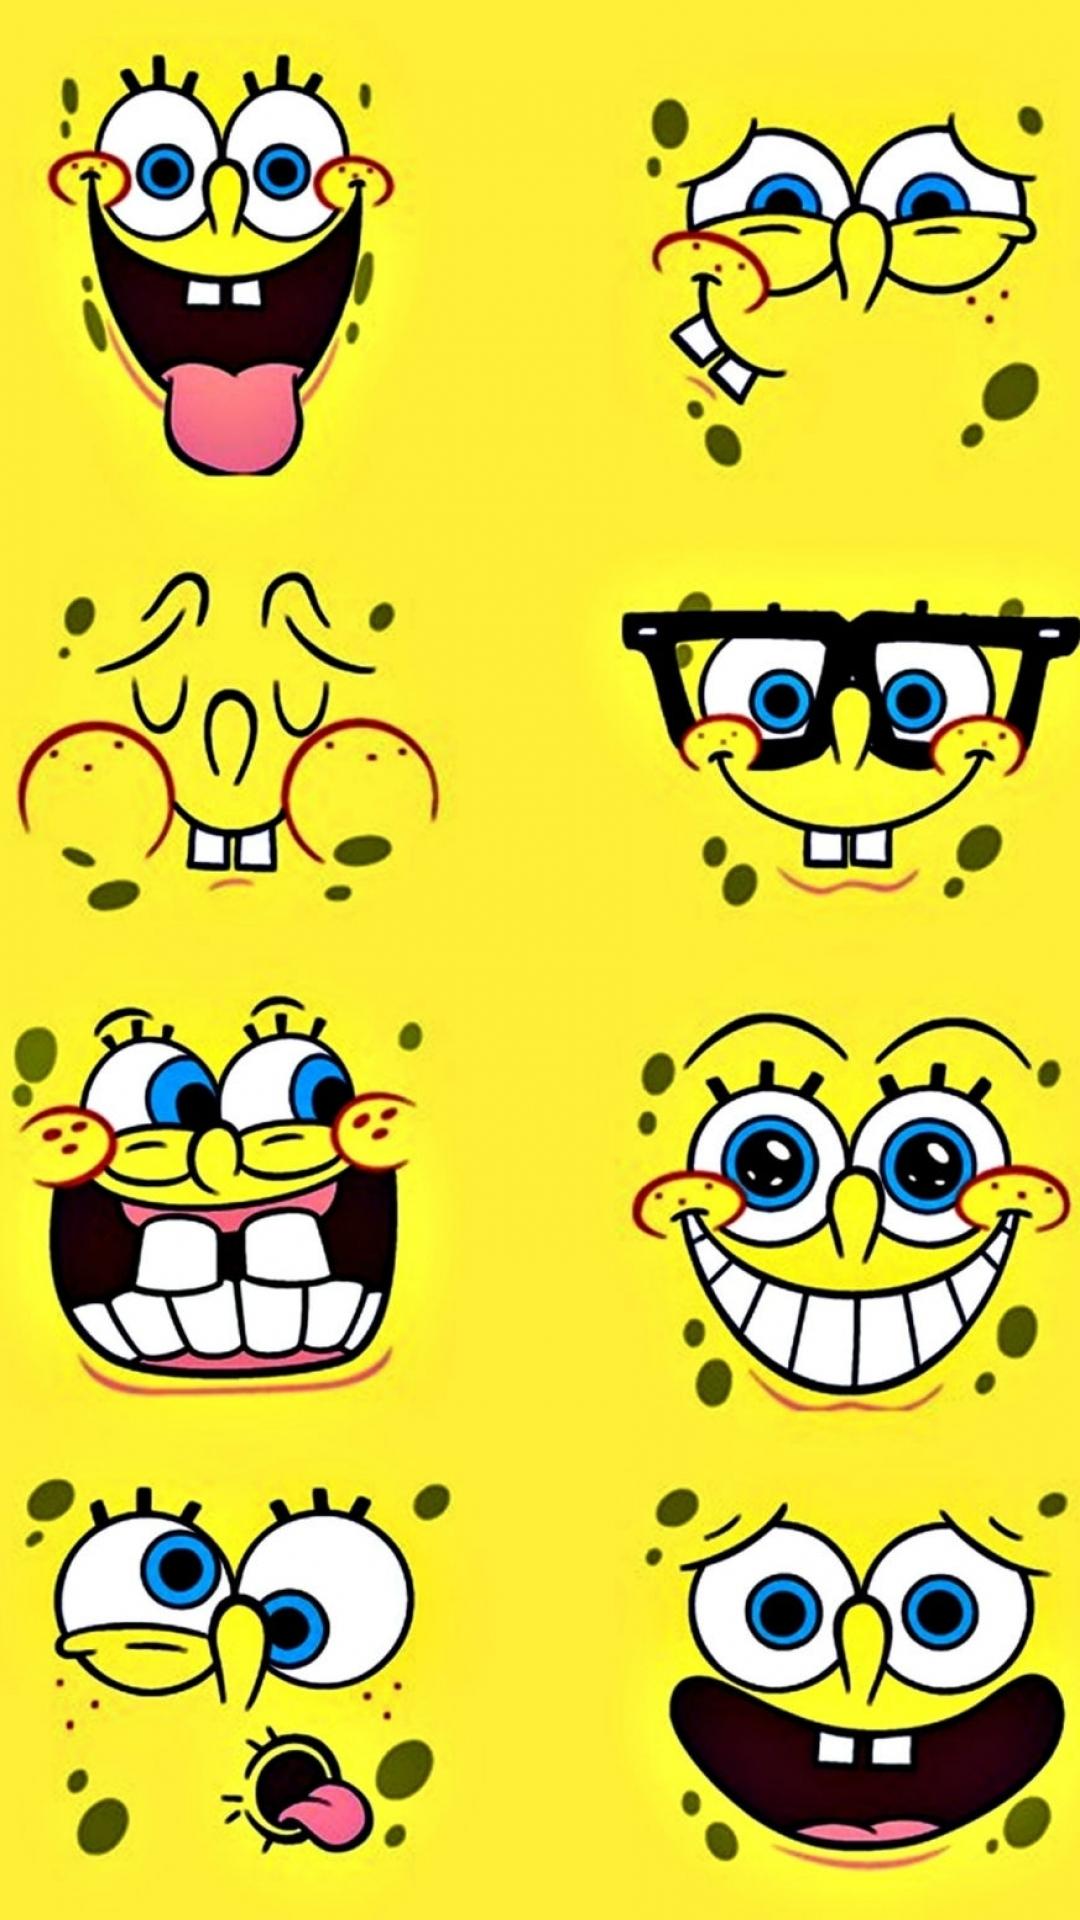 6 Spongebob Squarepants Apple Iphone 7 Plus 1080x1920